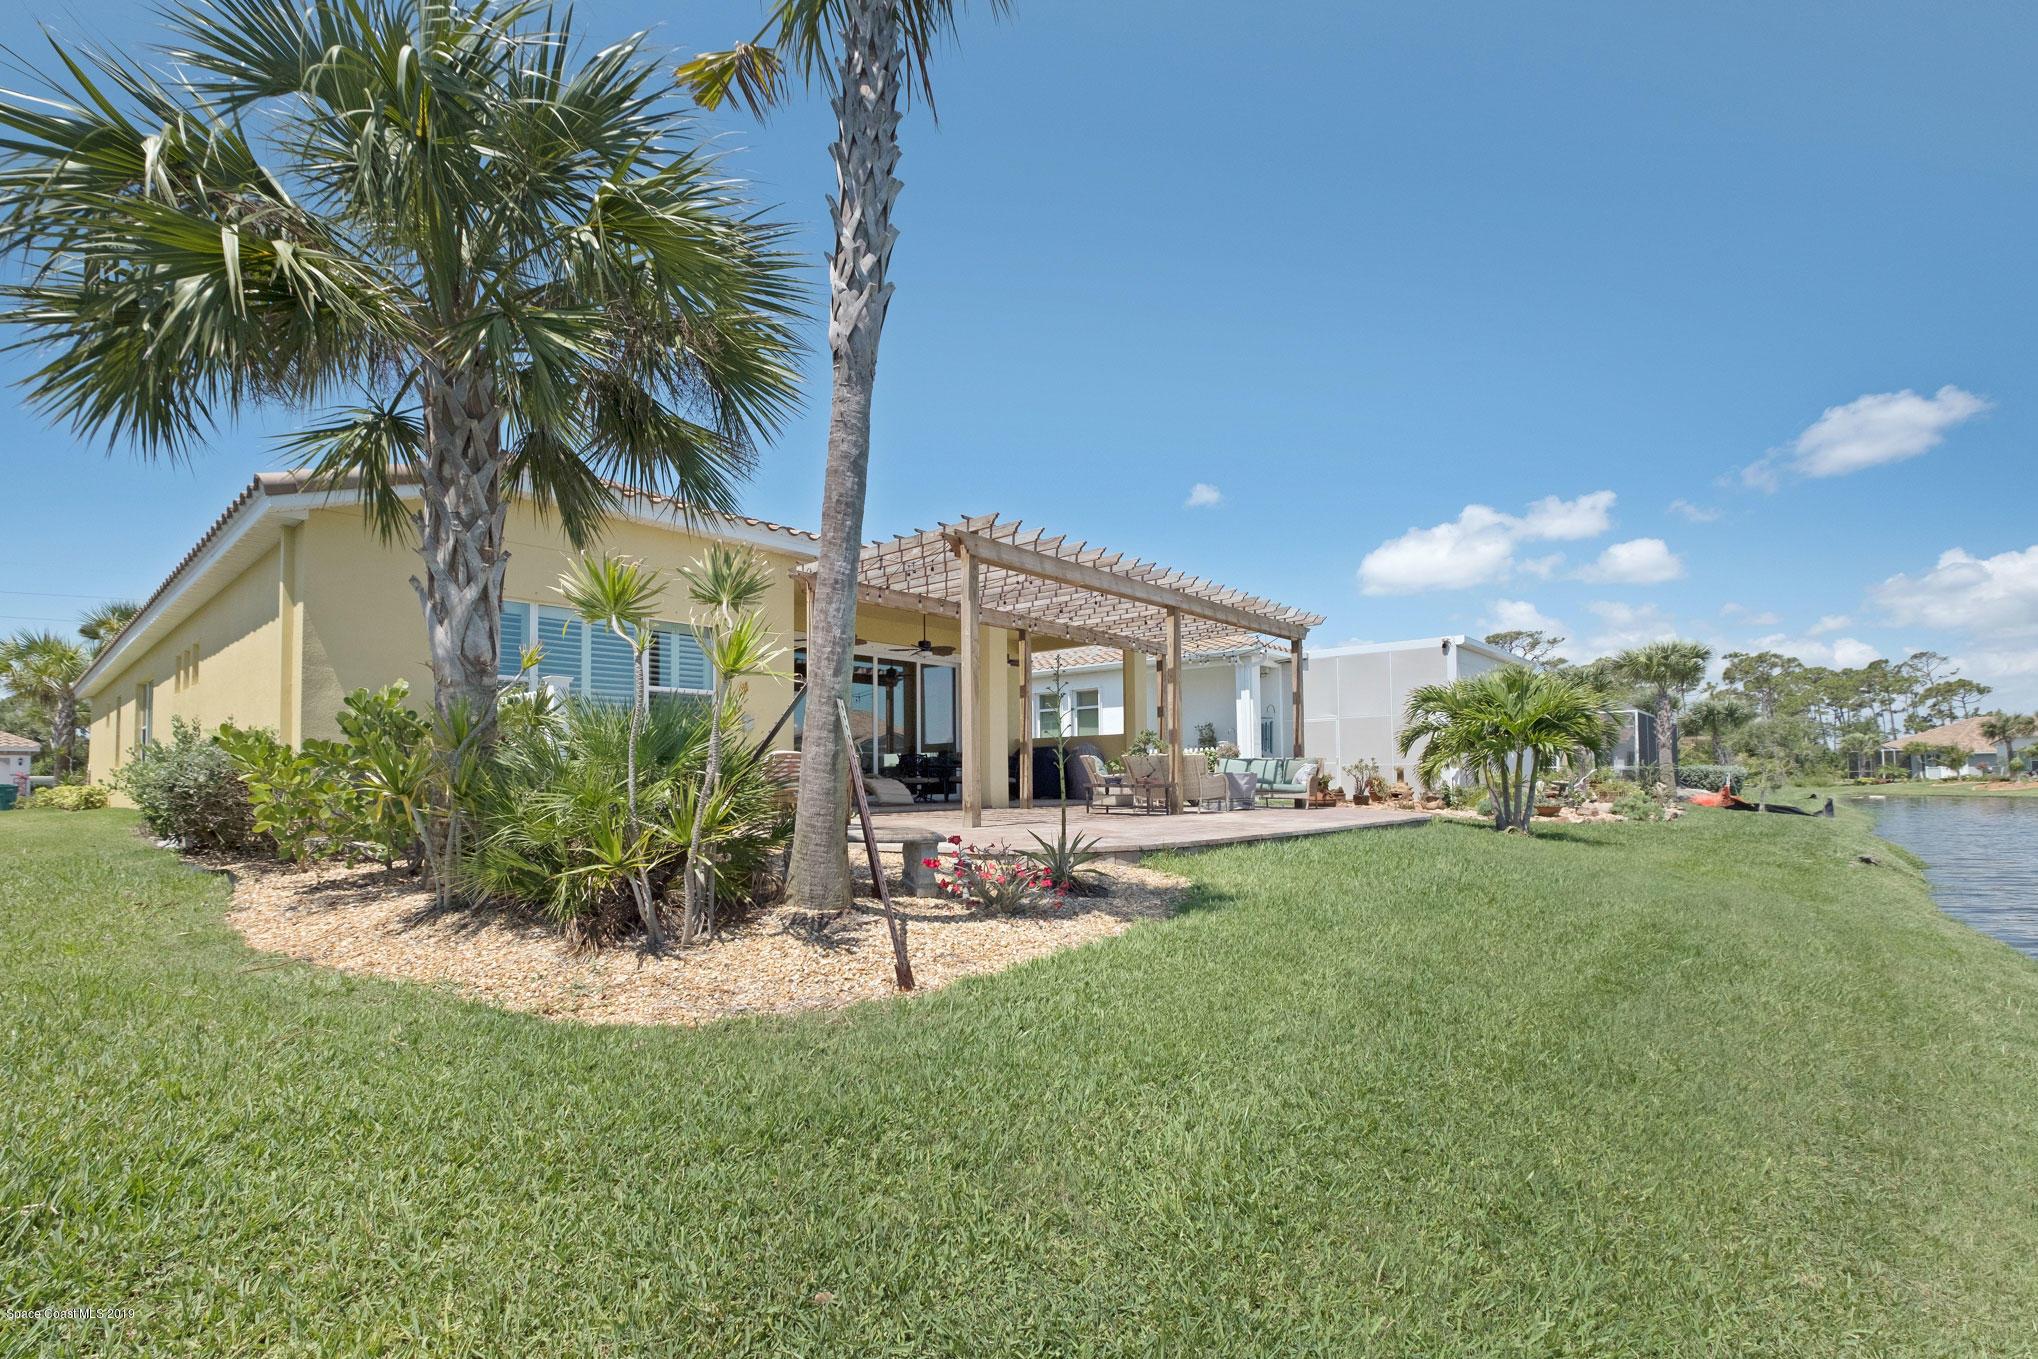 Single Family Homes for Sale at 3650 Poseidon Melbourne, Florida 32903 United States